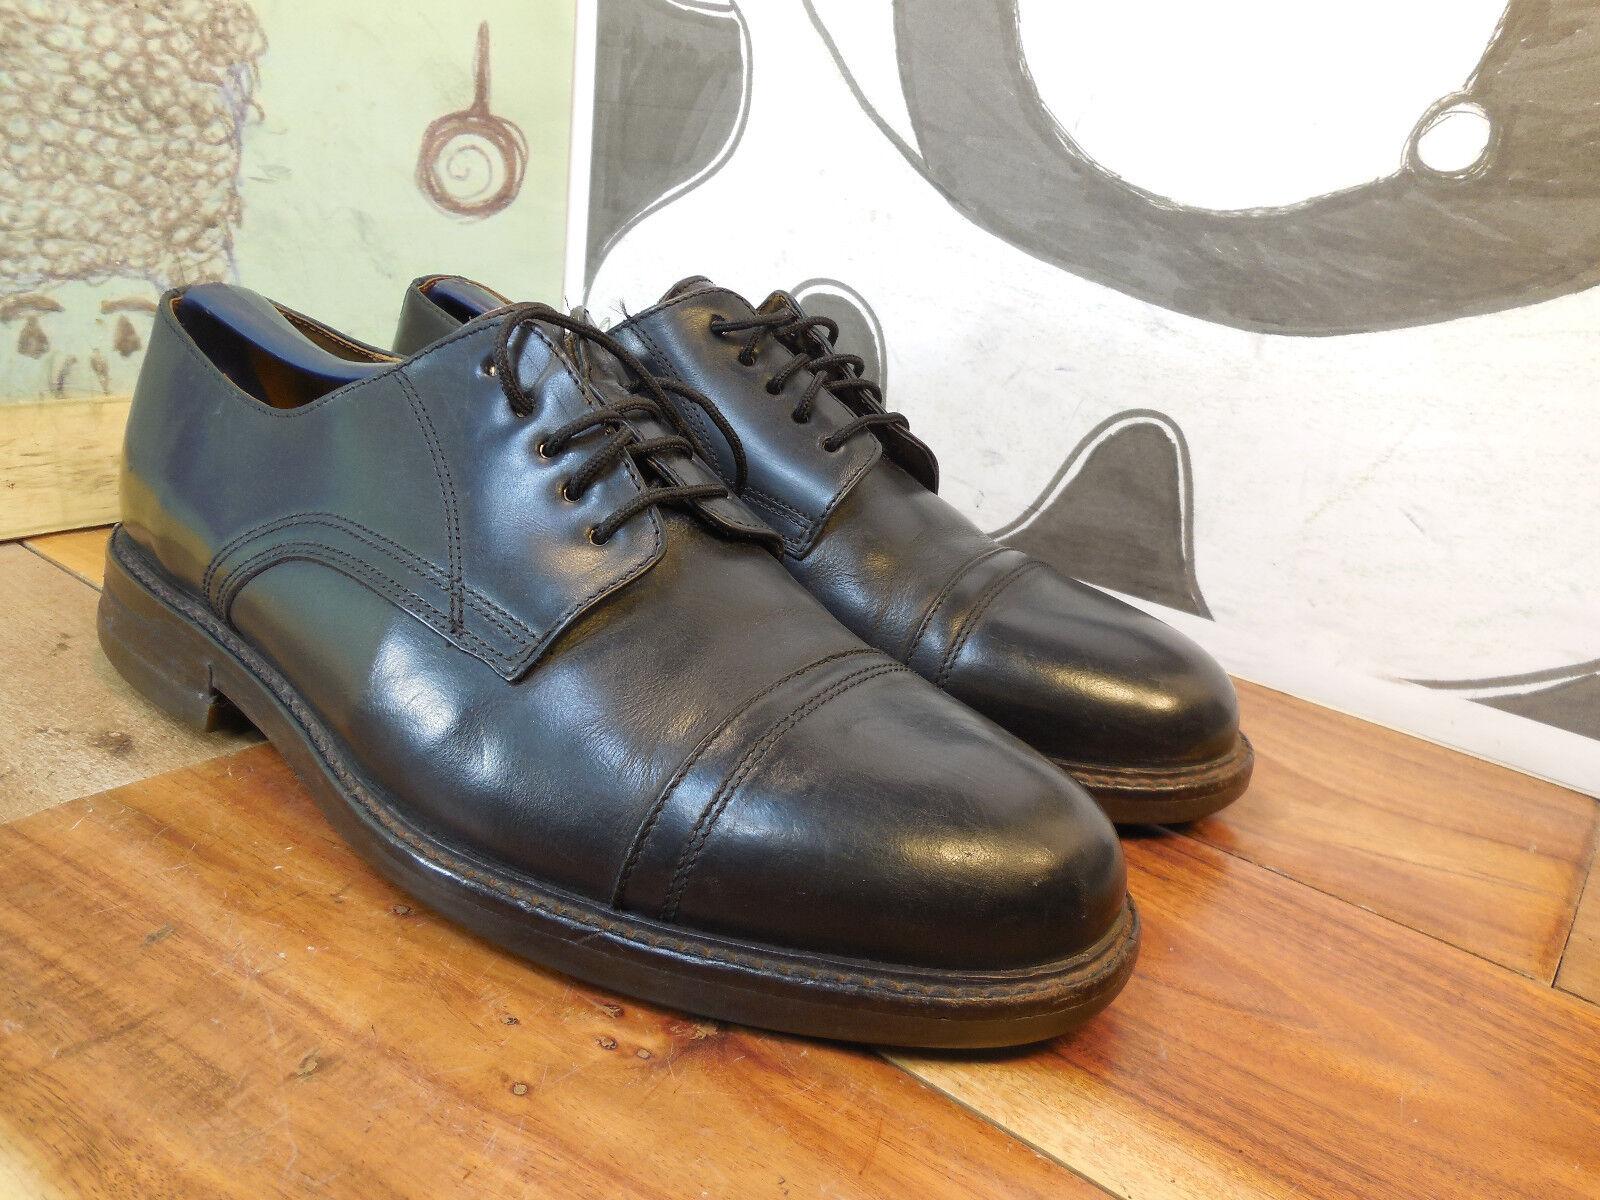 Truly Vintage Black Leather Cap Toe Oxfords Men's (see Euro 42 US 9M (see Men's msmts) 43d6cf